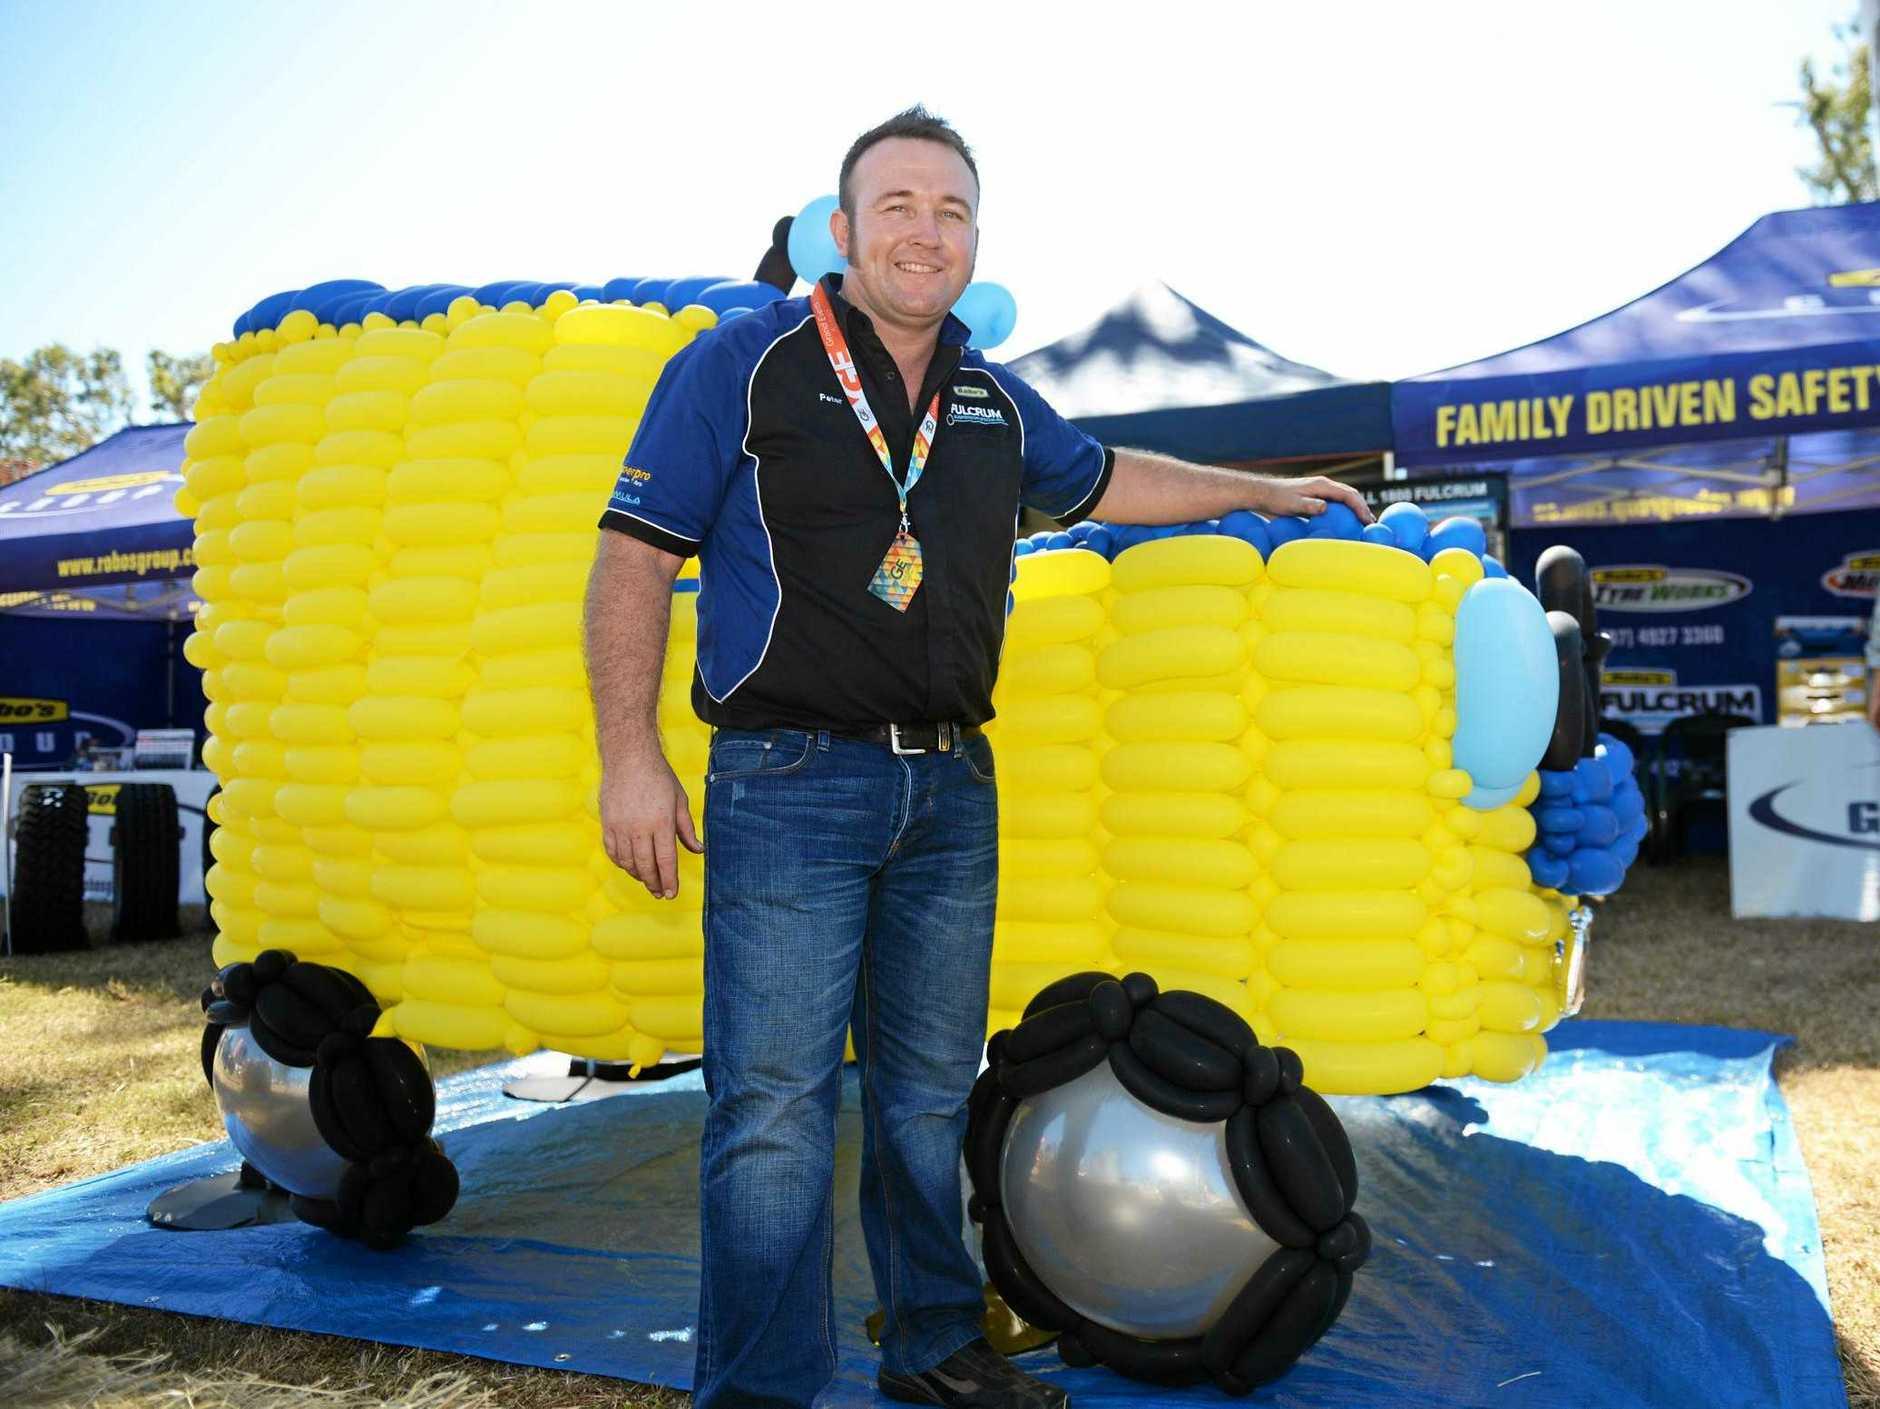 CQ mega Lifestyle Expo. Managing director at Robbos group, Peter Robinson - Balloon car . Photo Allan Reinikka / The Morning Bulletin